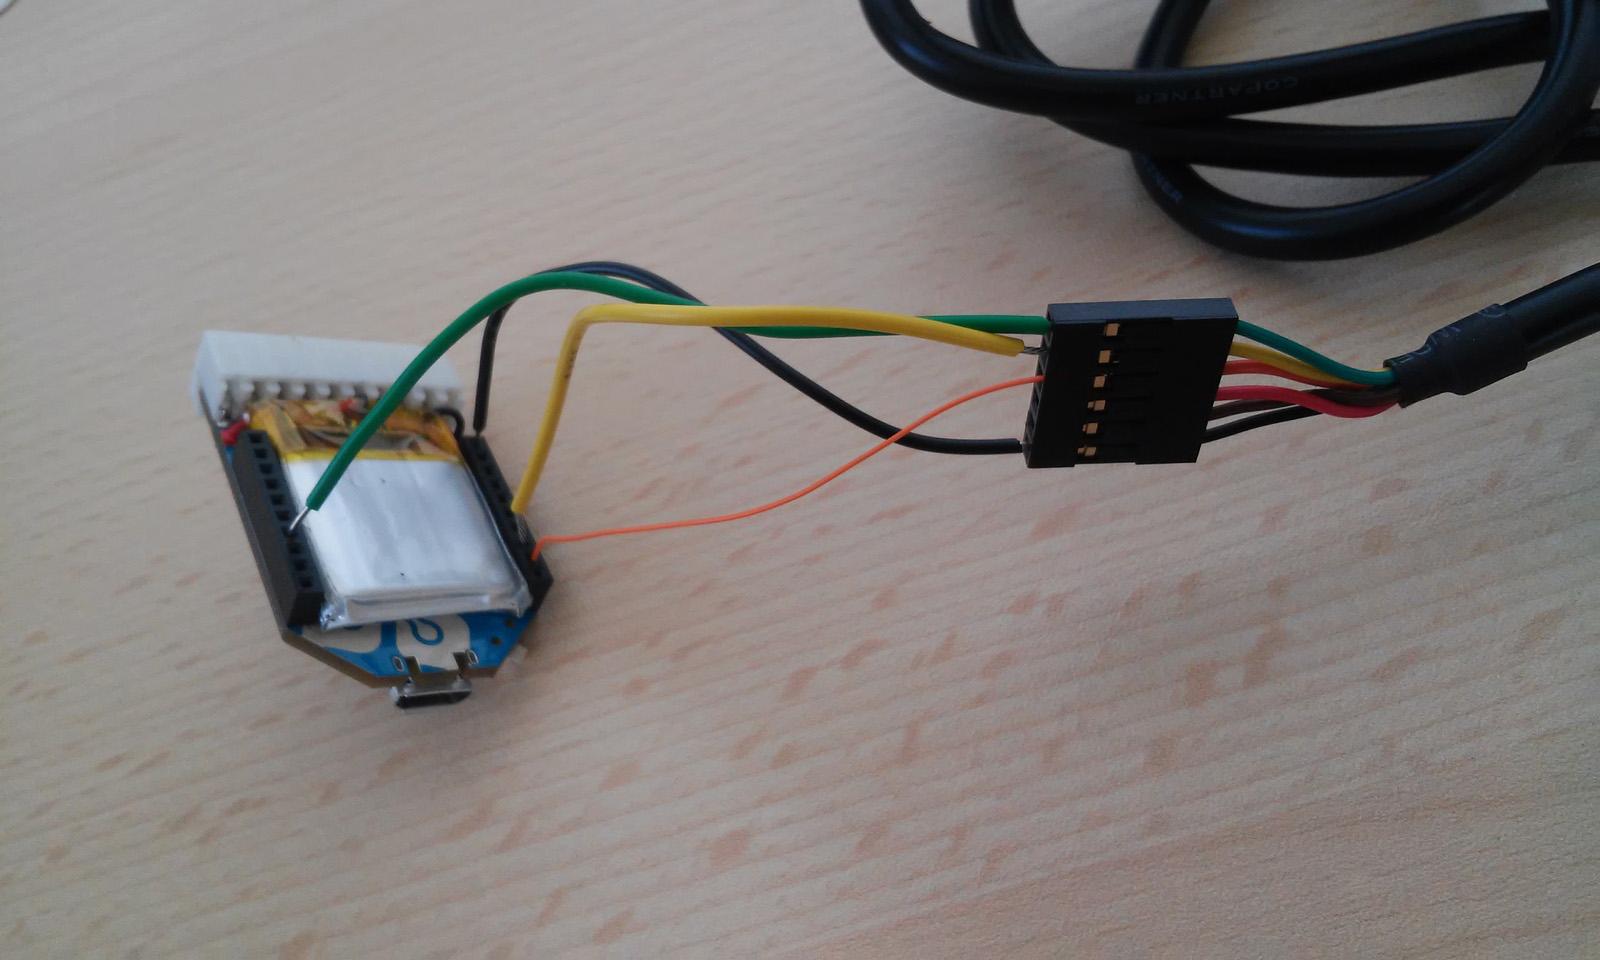 Faq Ftdi Usb Serial Cable Wiring Diagram Connection